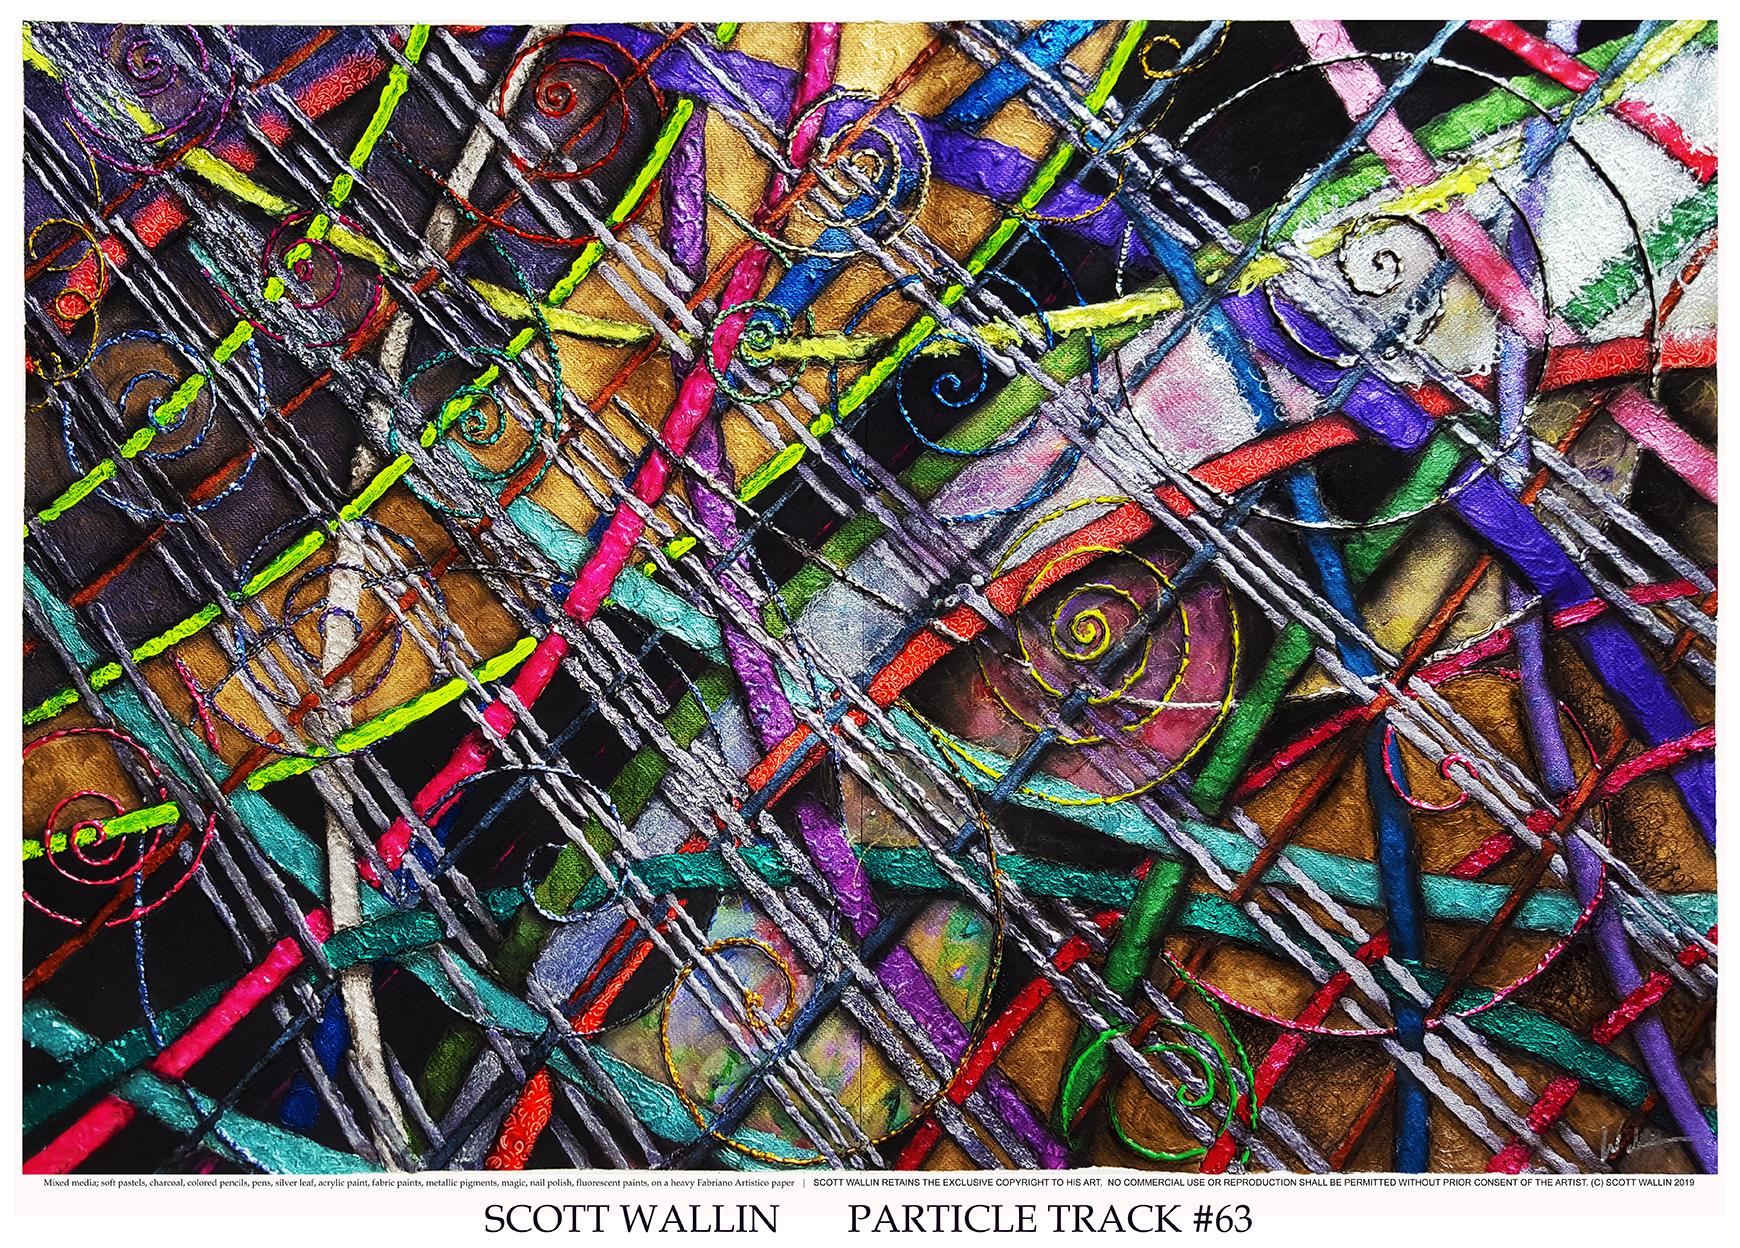 PARTICLE TRACK #63 (c) SCOTT WALLIN